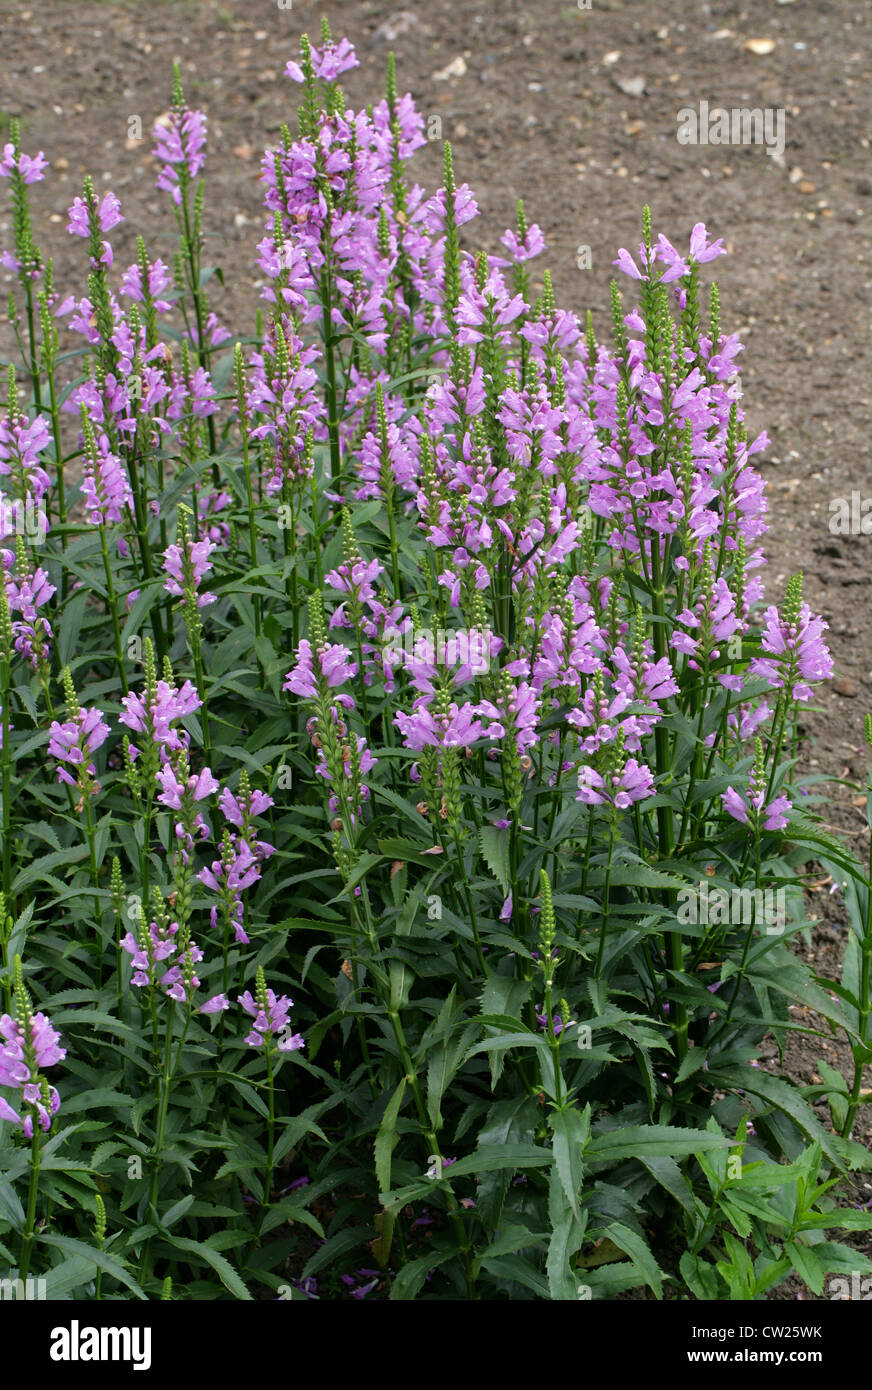 Obedient Plant or False Dragonhead, Physostegia virginiana 'Summer Spire', Lamiaceae. USA, North America. - Stock Image